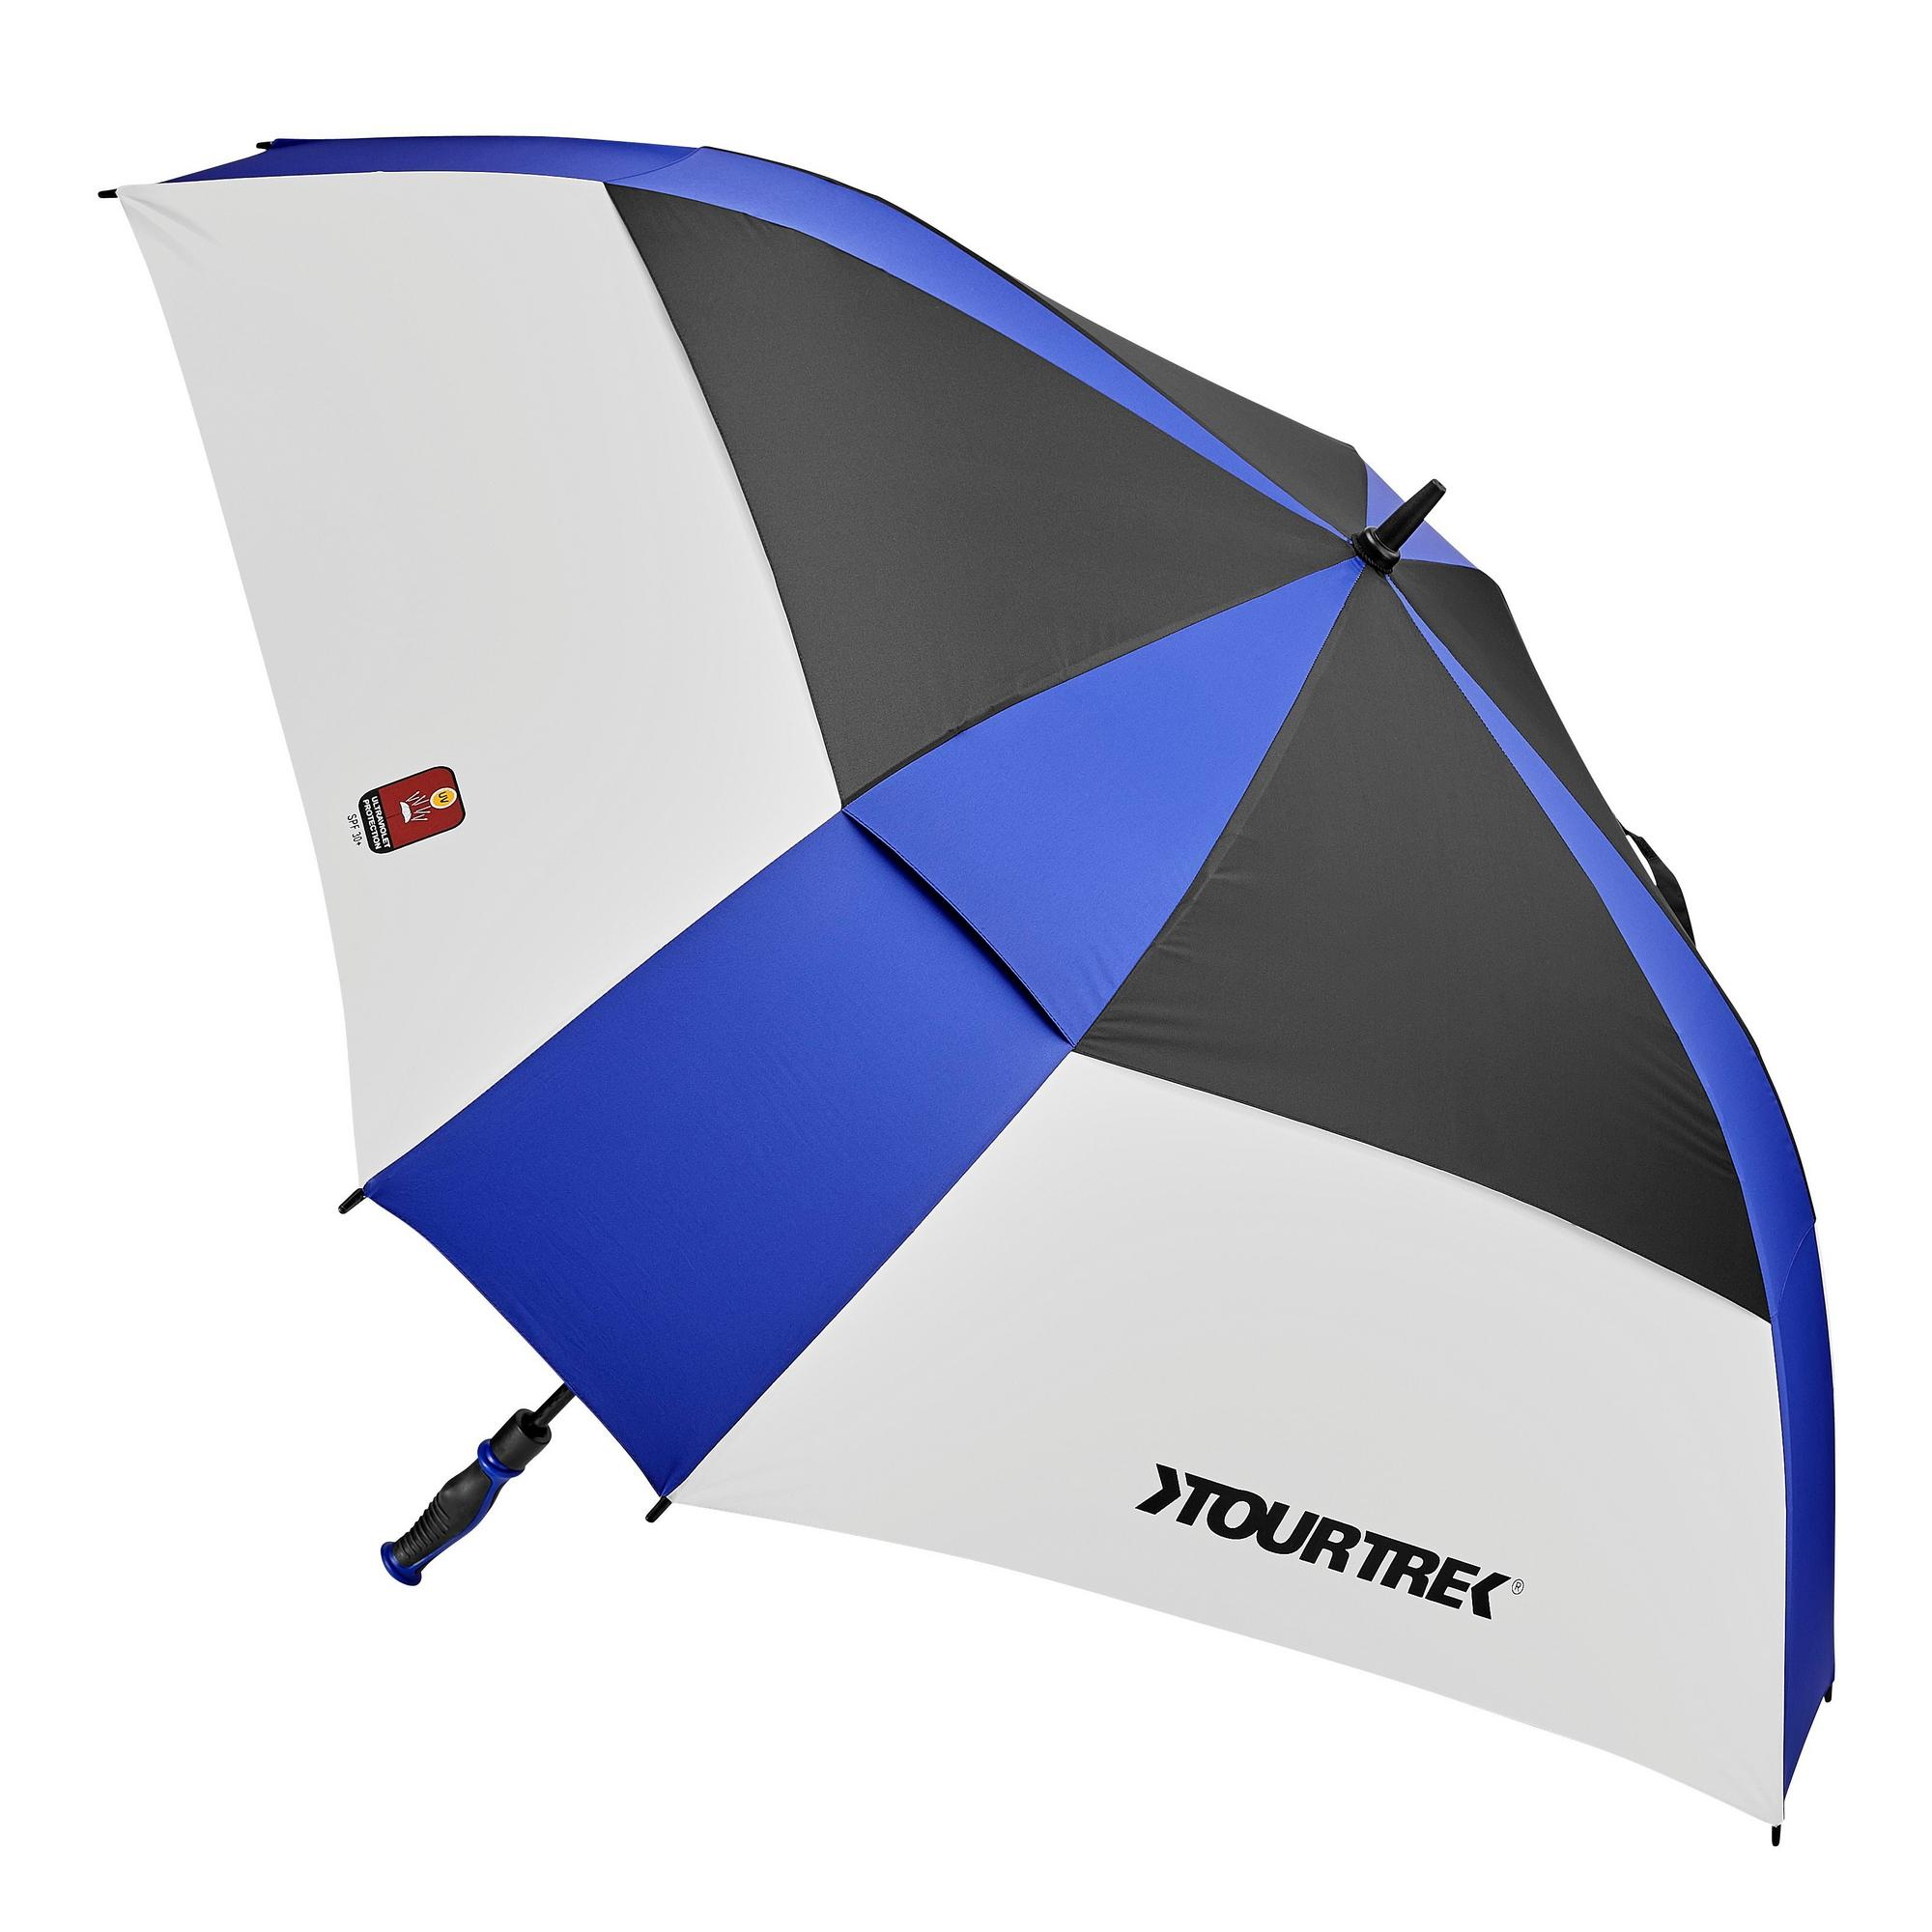 "68"" Tour Deluxe SPF 30+ Umbrella"